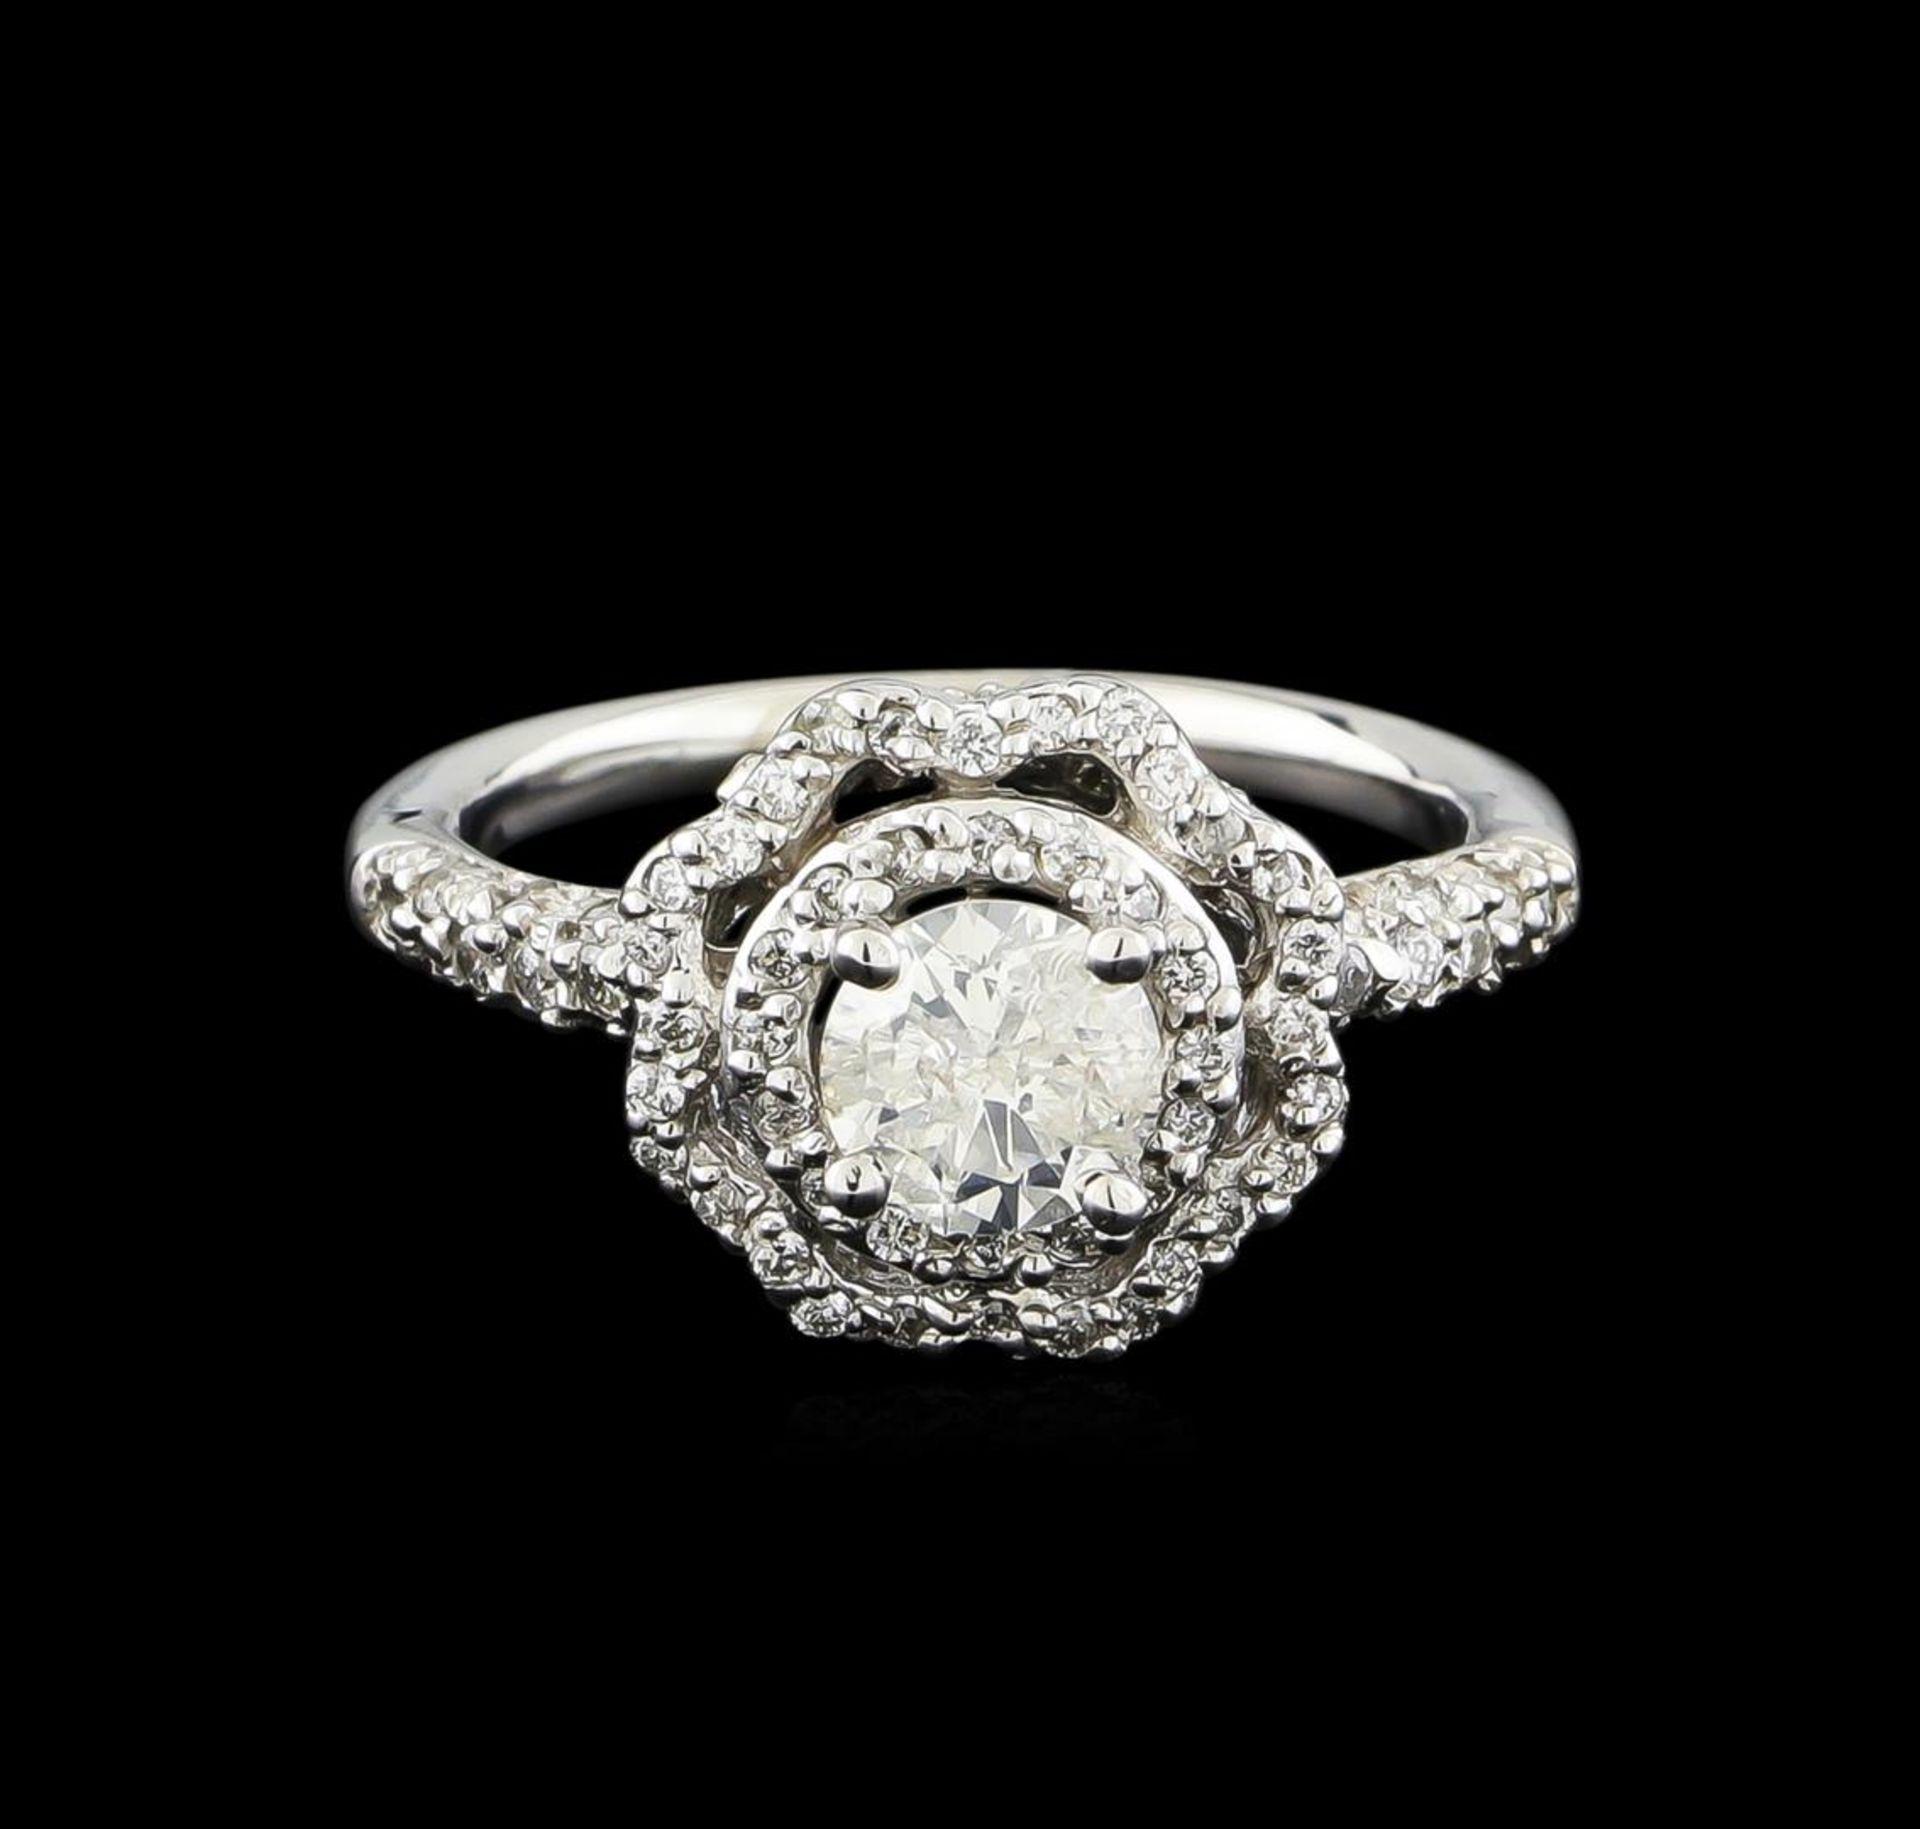 14KT White Gold 0.95 ctw Diamond Ring - Image 2 of 5